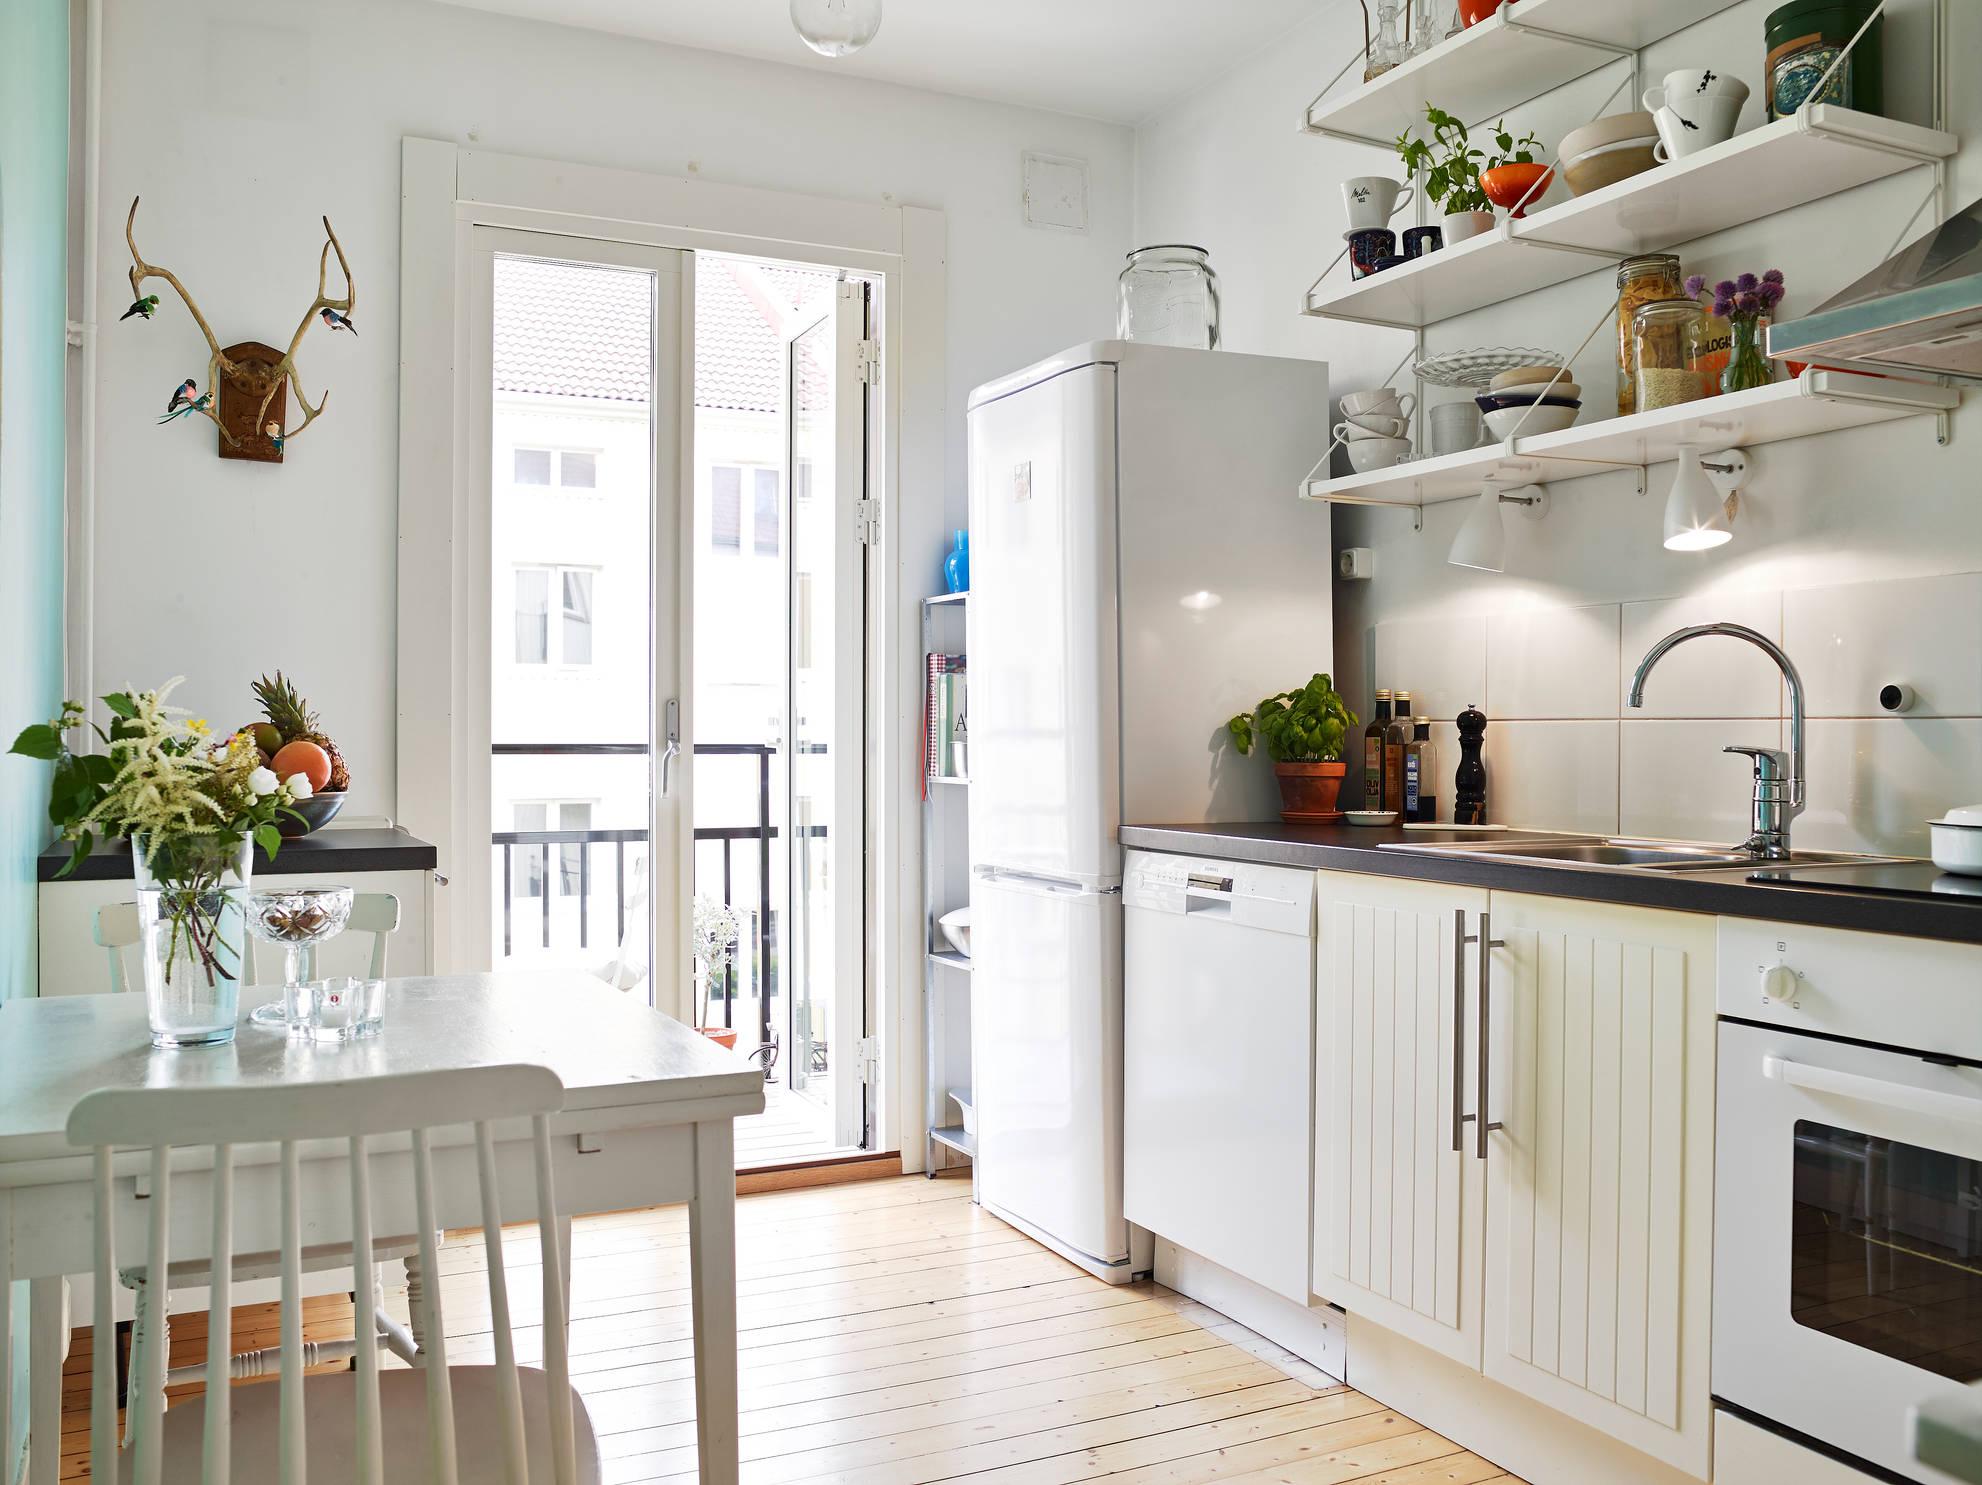 Chill decoraci n un hogar modesto pero acogedor - Muebles modesto ...